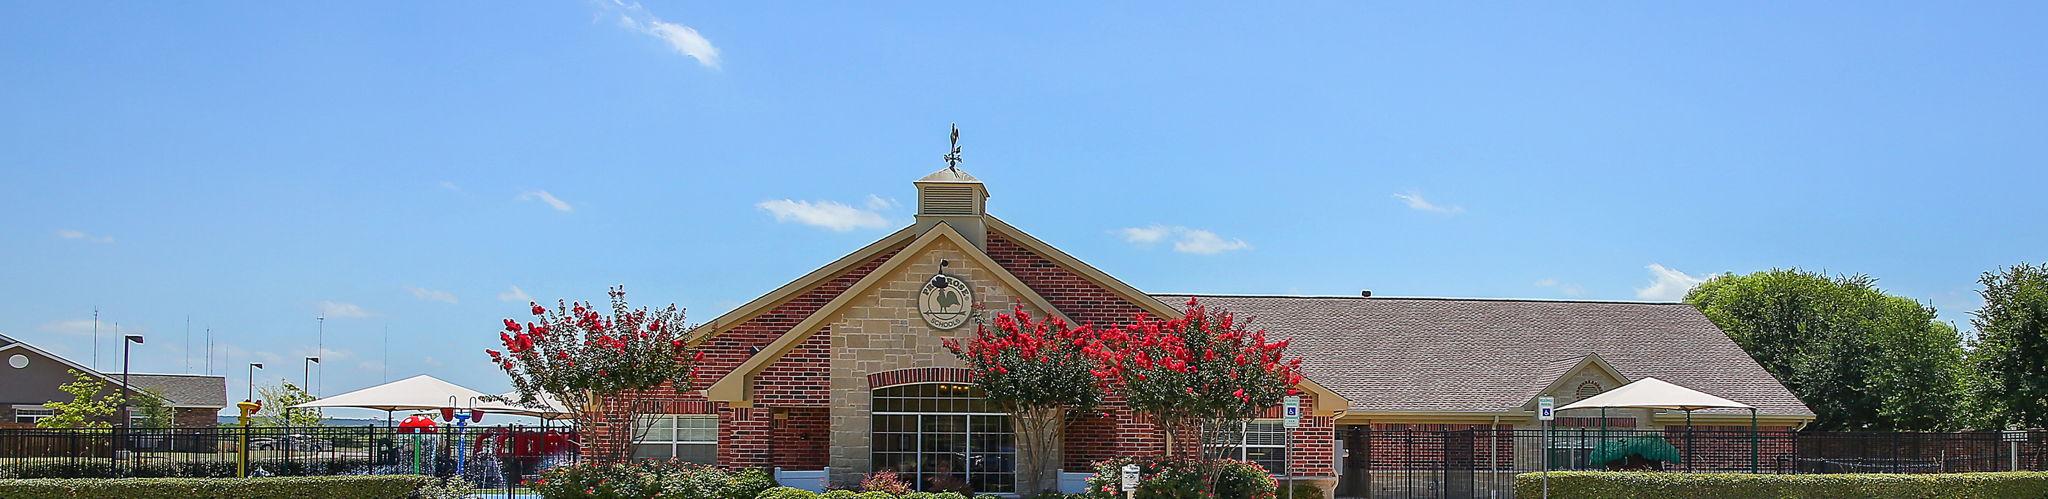 Exterior of a Primrose School of Grand Peninsula